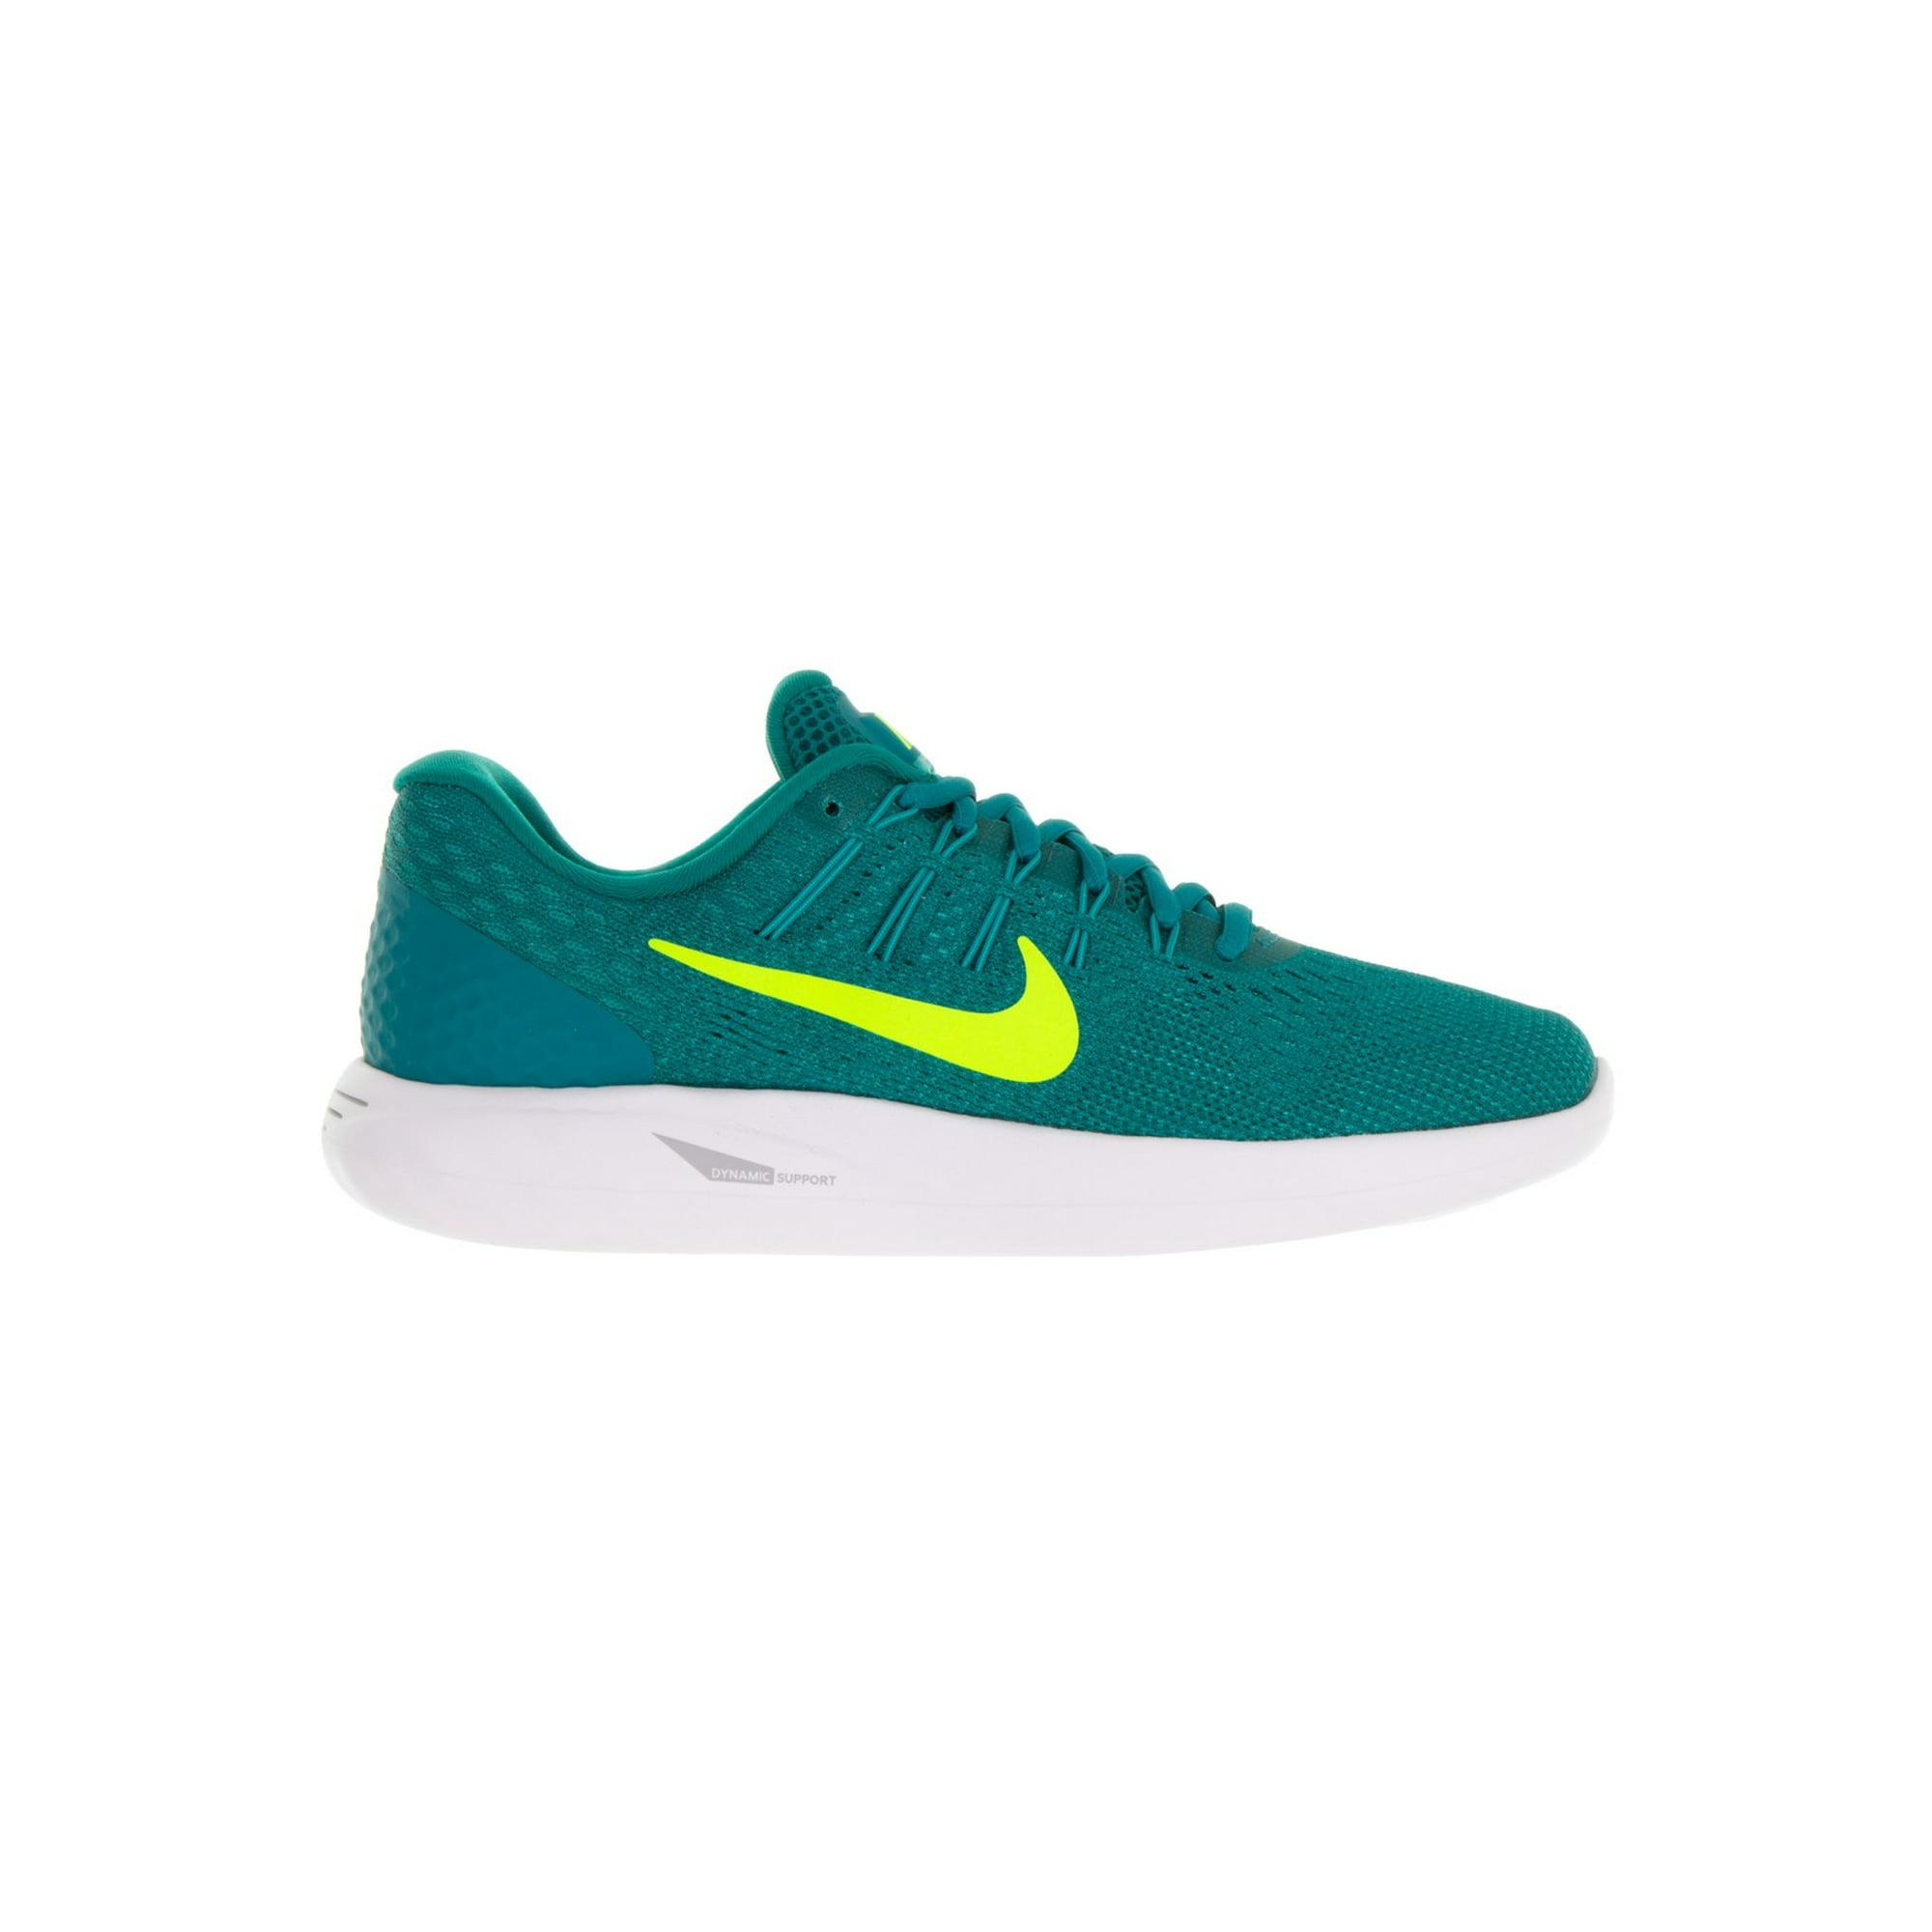 d7492a54005 Nike Women s Lunarglide 8 Racer Blue   Black Ankle-High Mesh Running Shoe -  9.5M